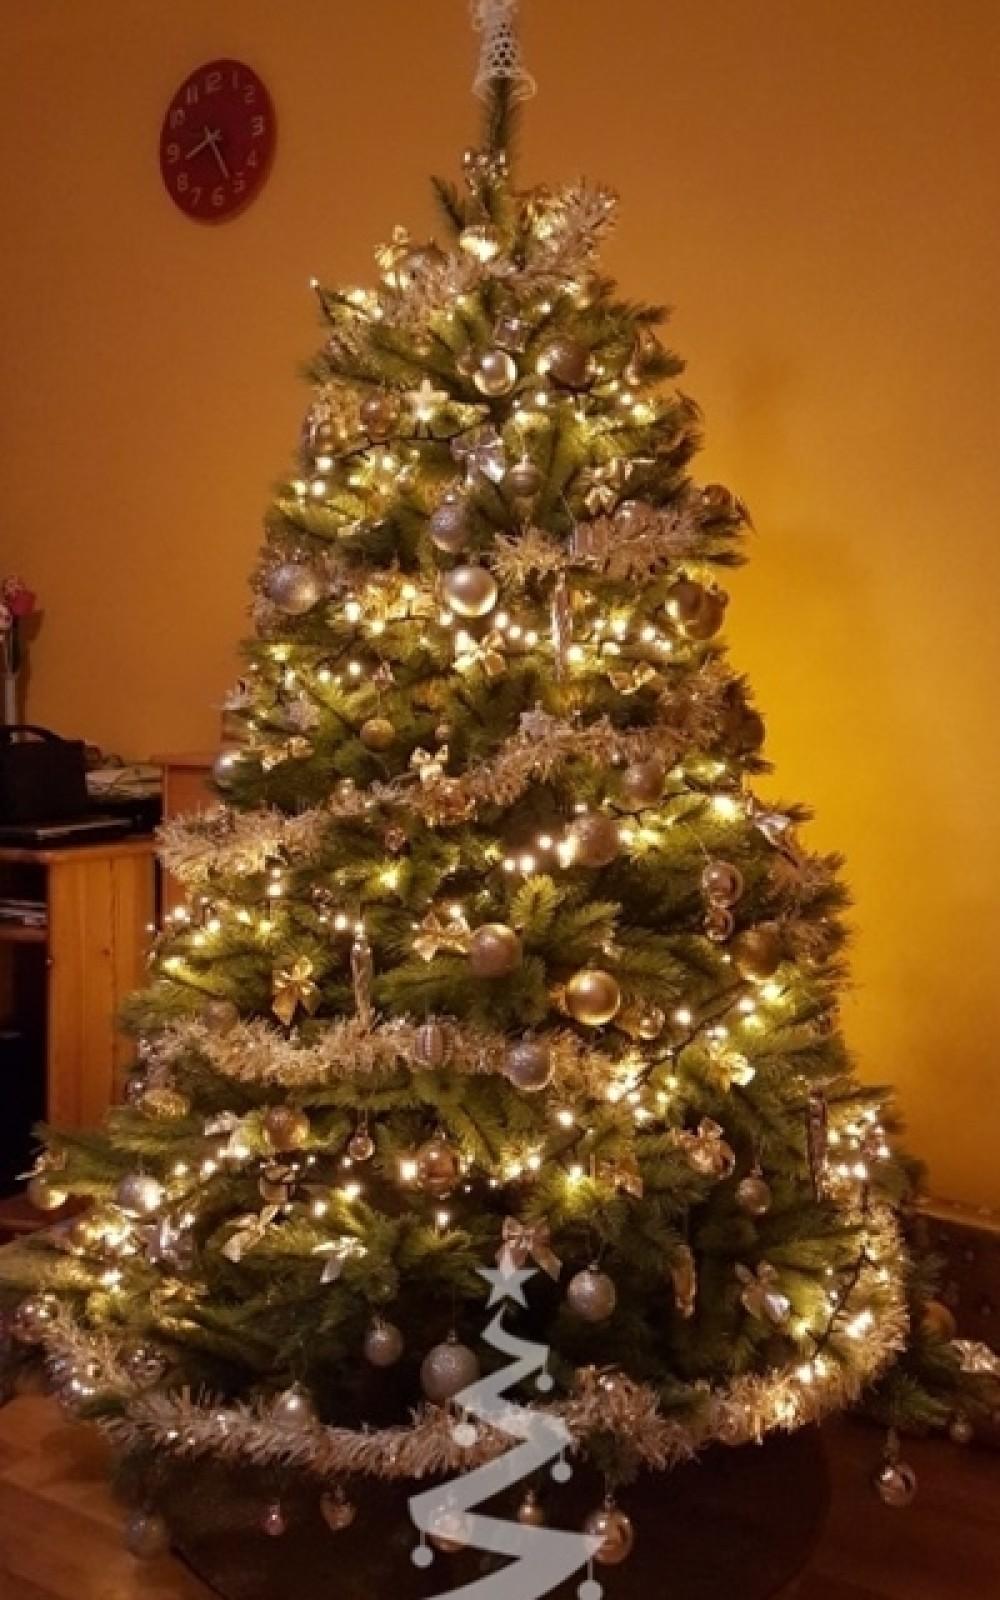 Karácsonyfa-Műfenyő-Forest Frosted Pine 230 cm